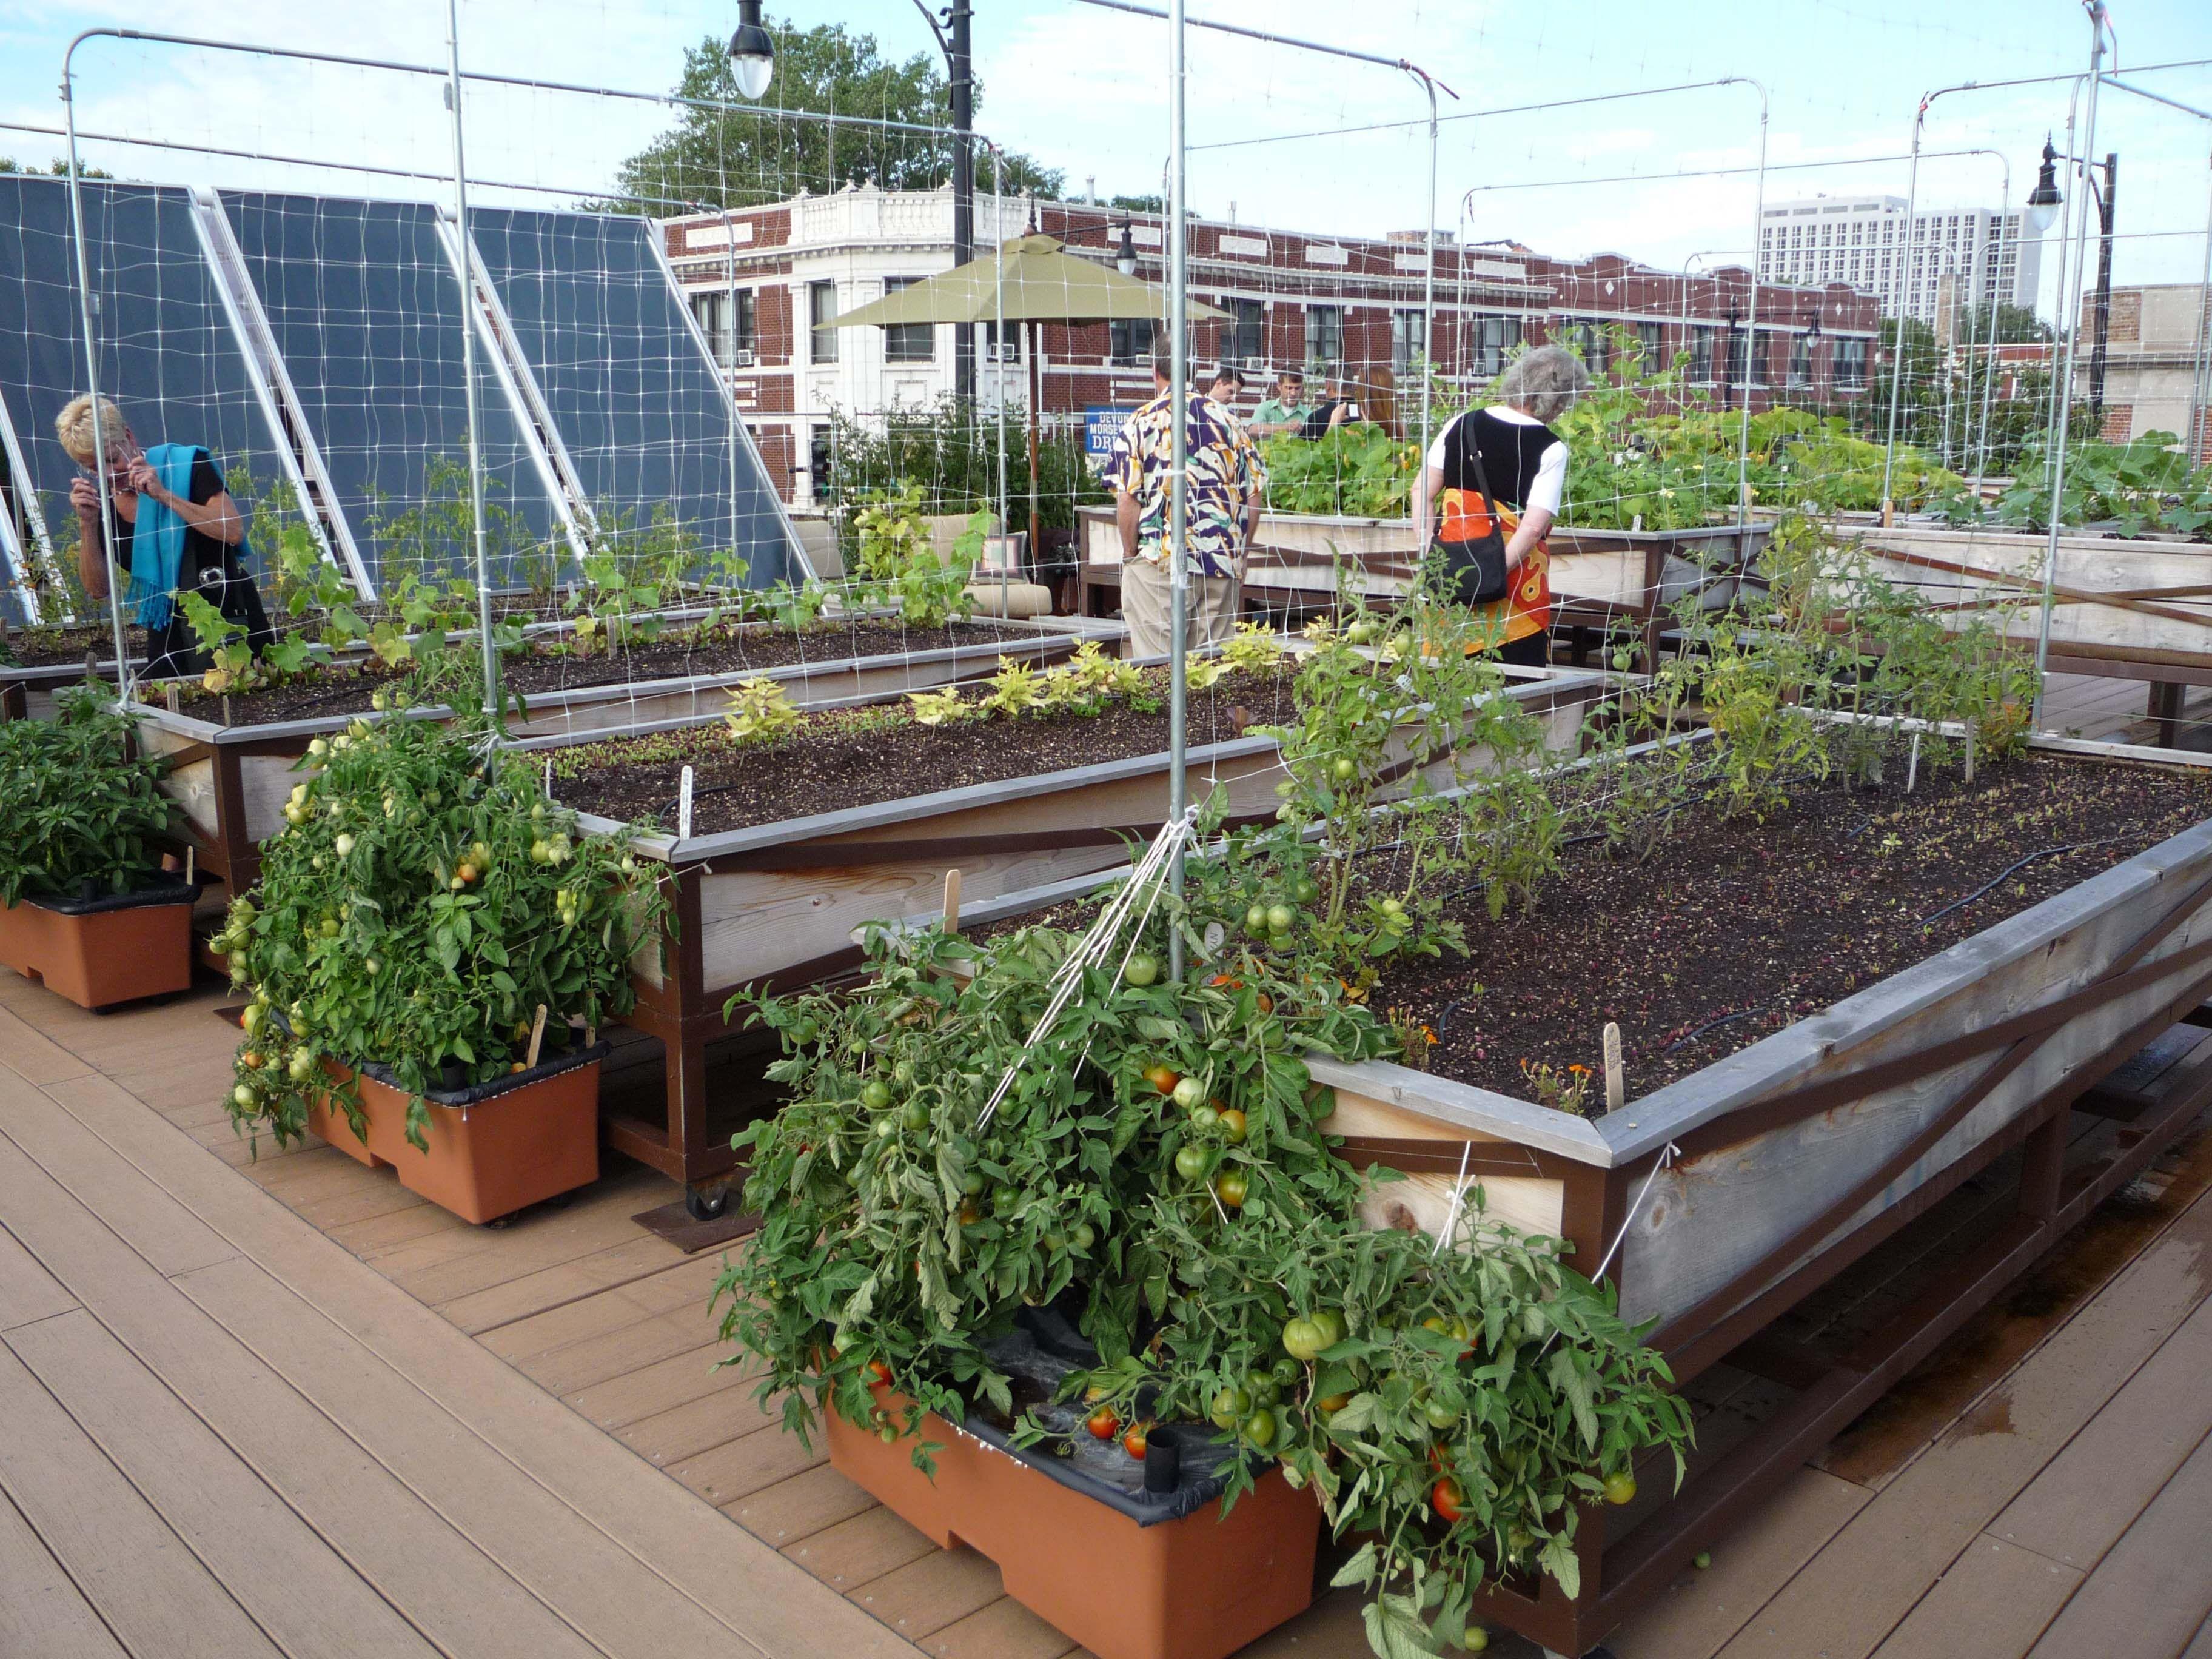 Garden Ideas Rooftop Garden Definition With Images Garden